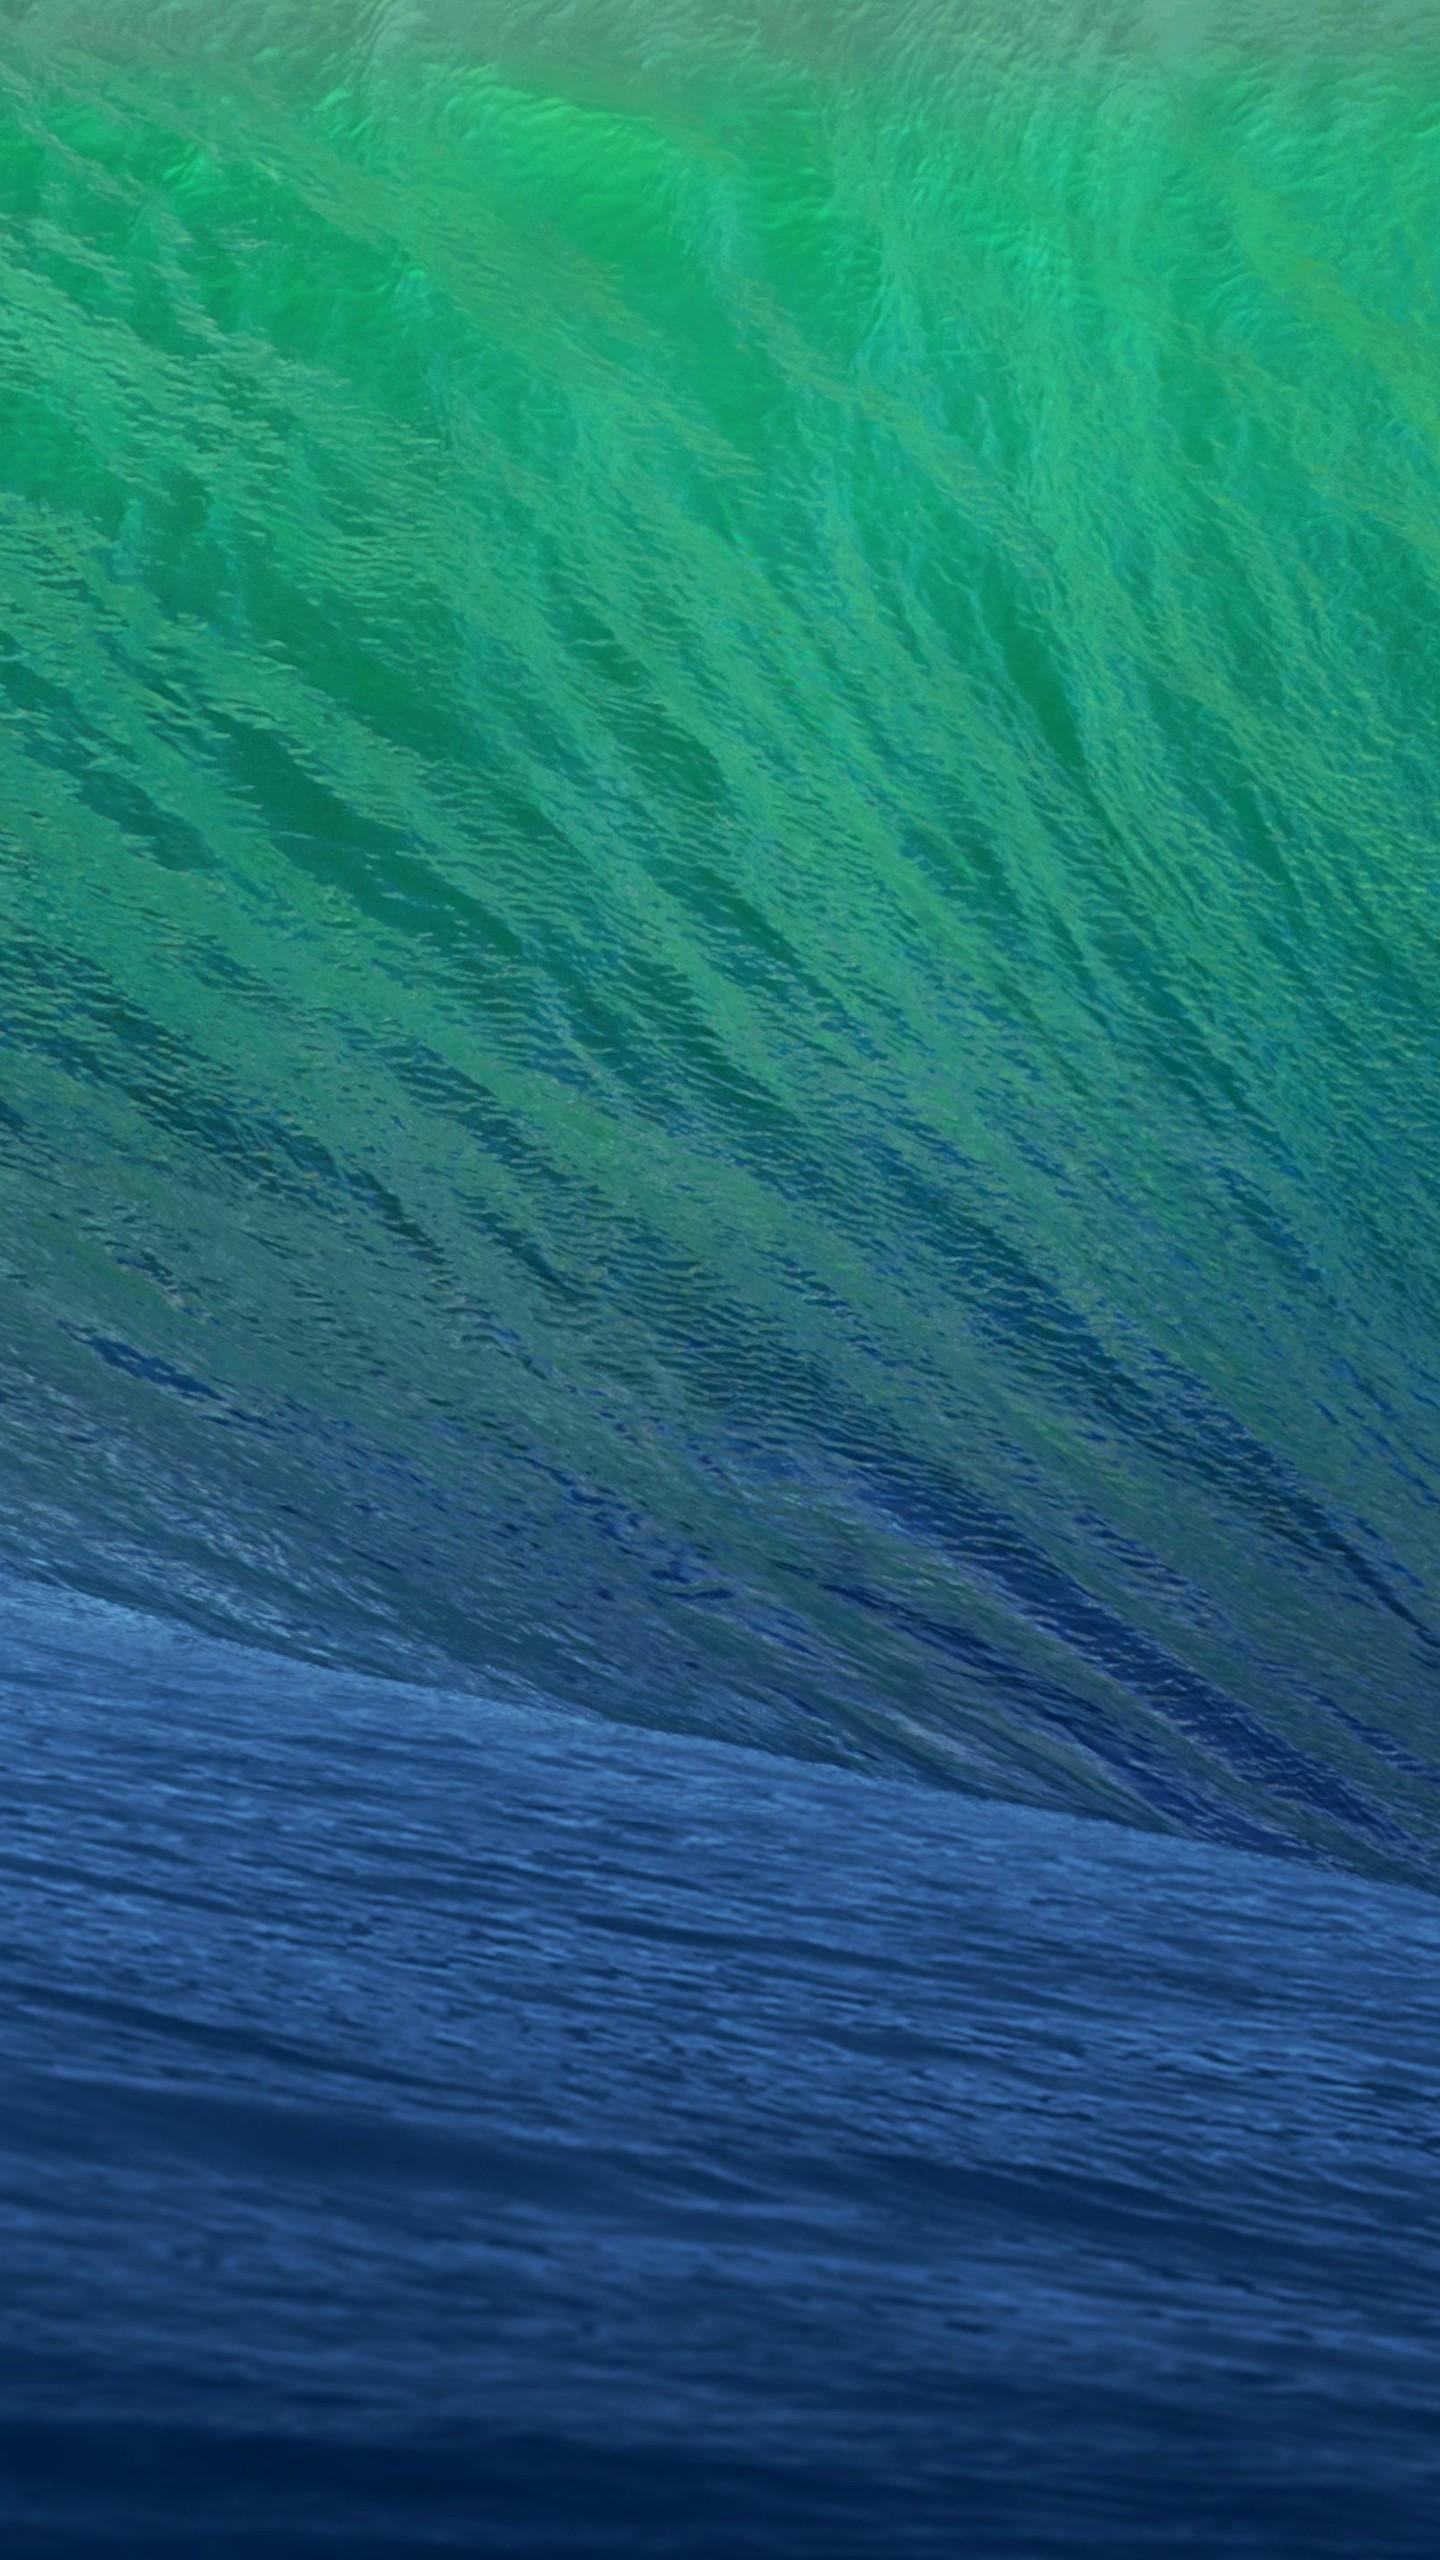 Wallpaper Apple, iOS 10, 4k, 5k, live